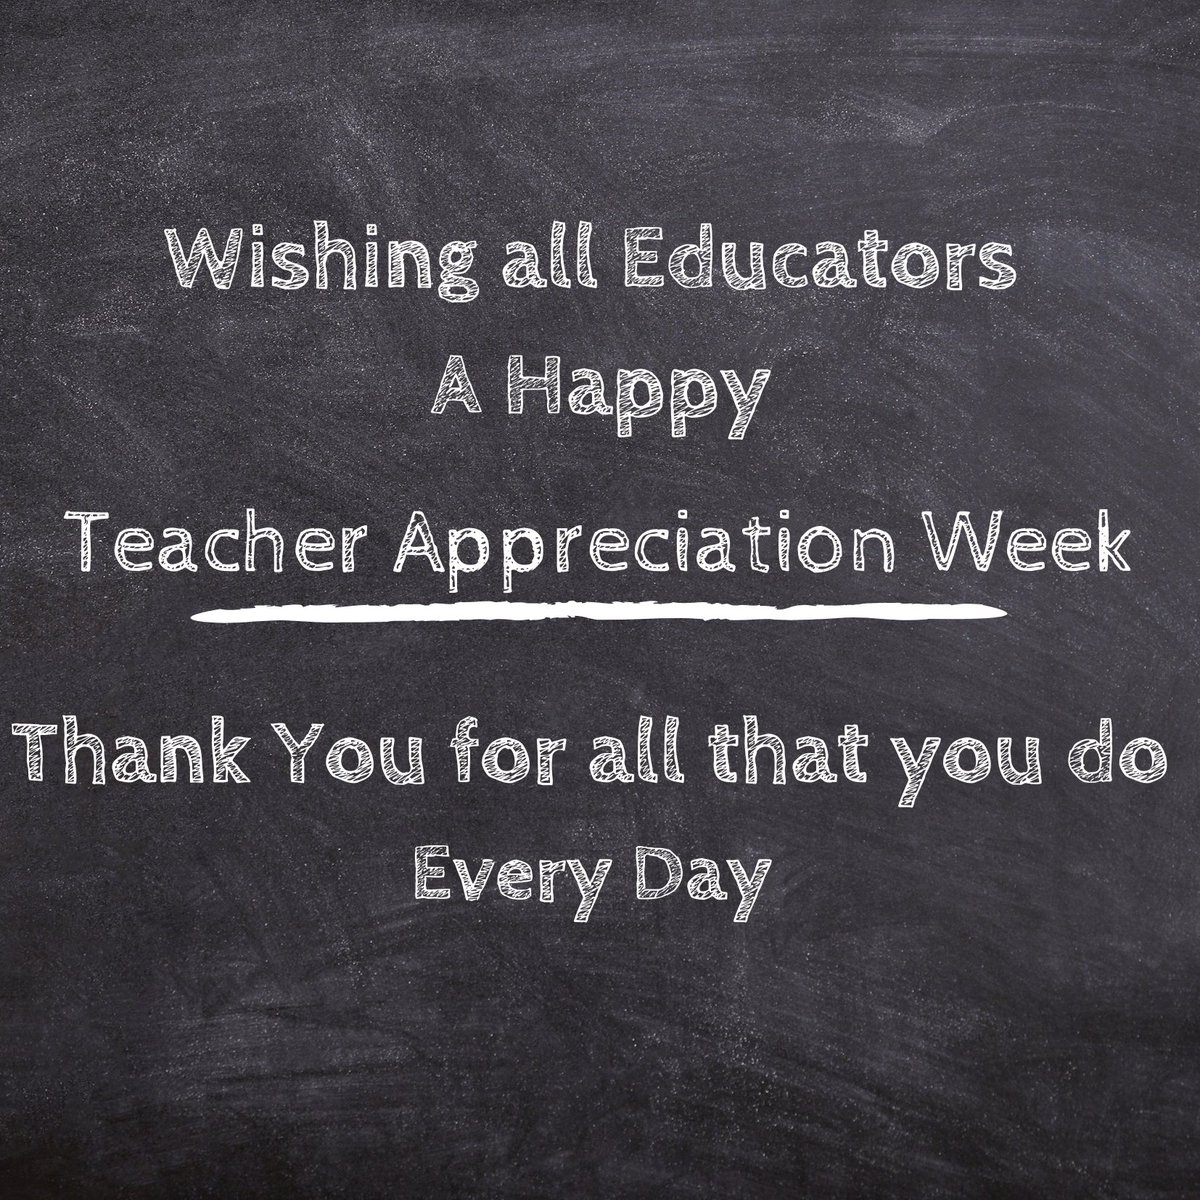 @SenJackReed's photo on #TeacherAppreciationWeek